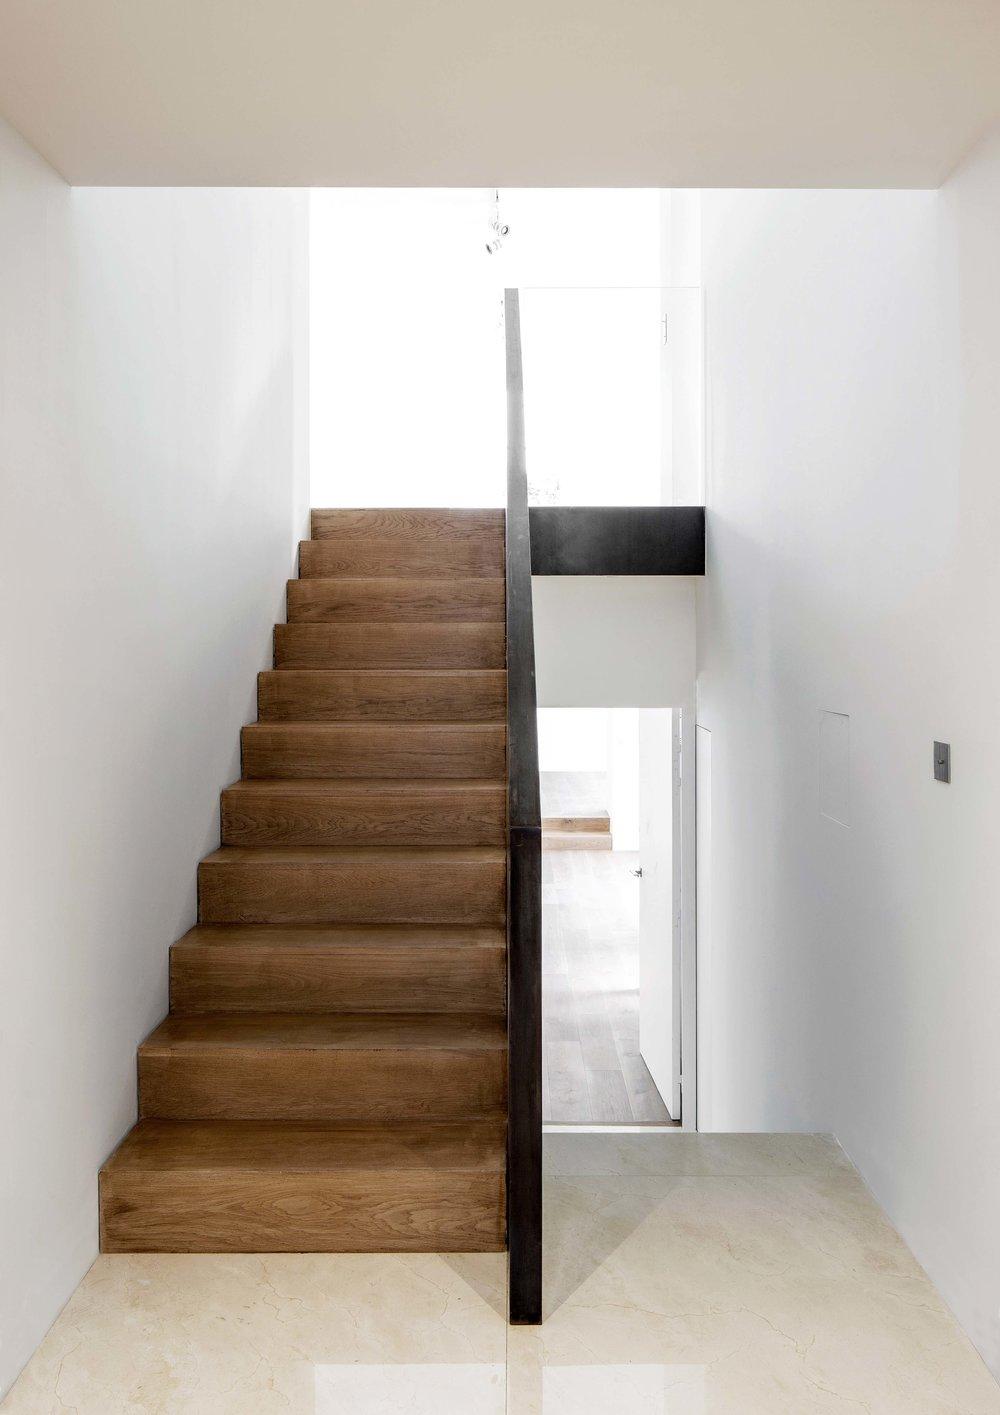 escalier intereur 1-qualité moyen.jpg